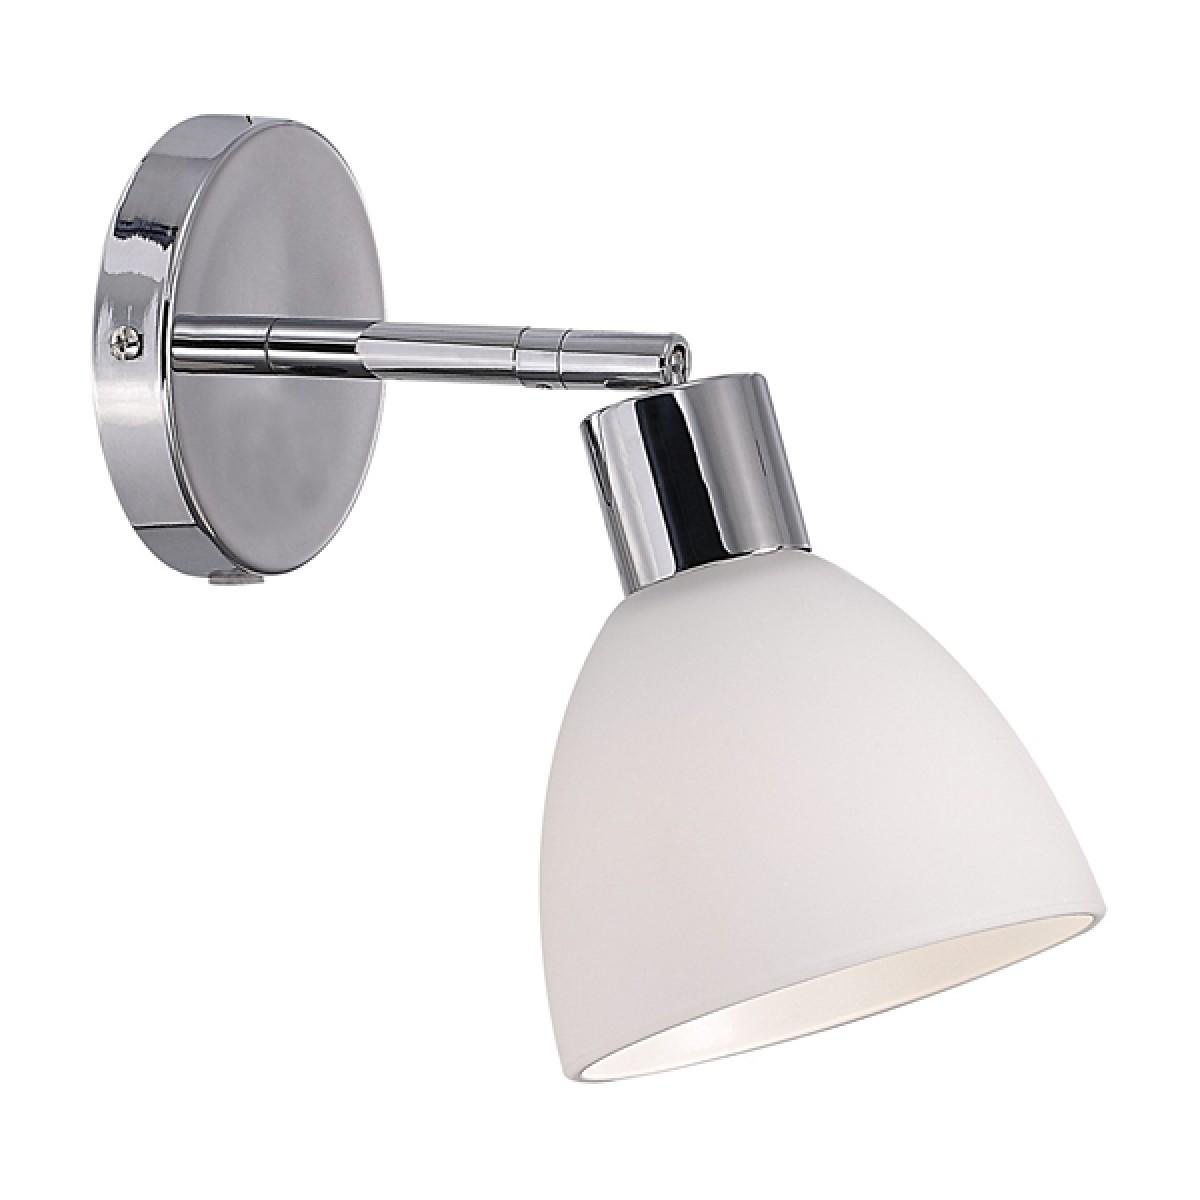 NORDLUX Ray væglampe krom / opal